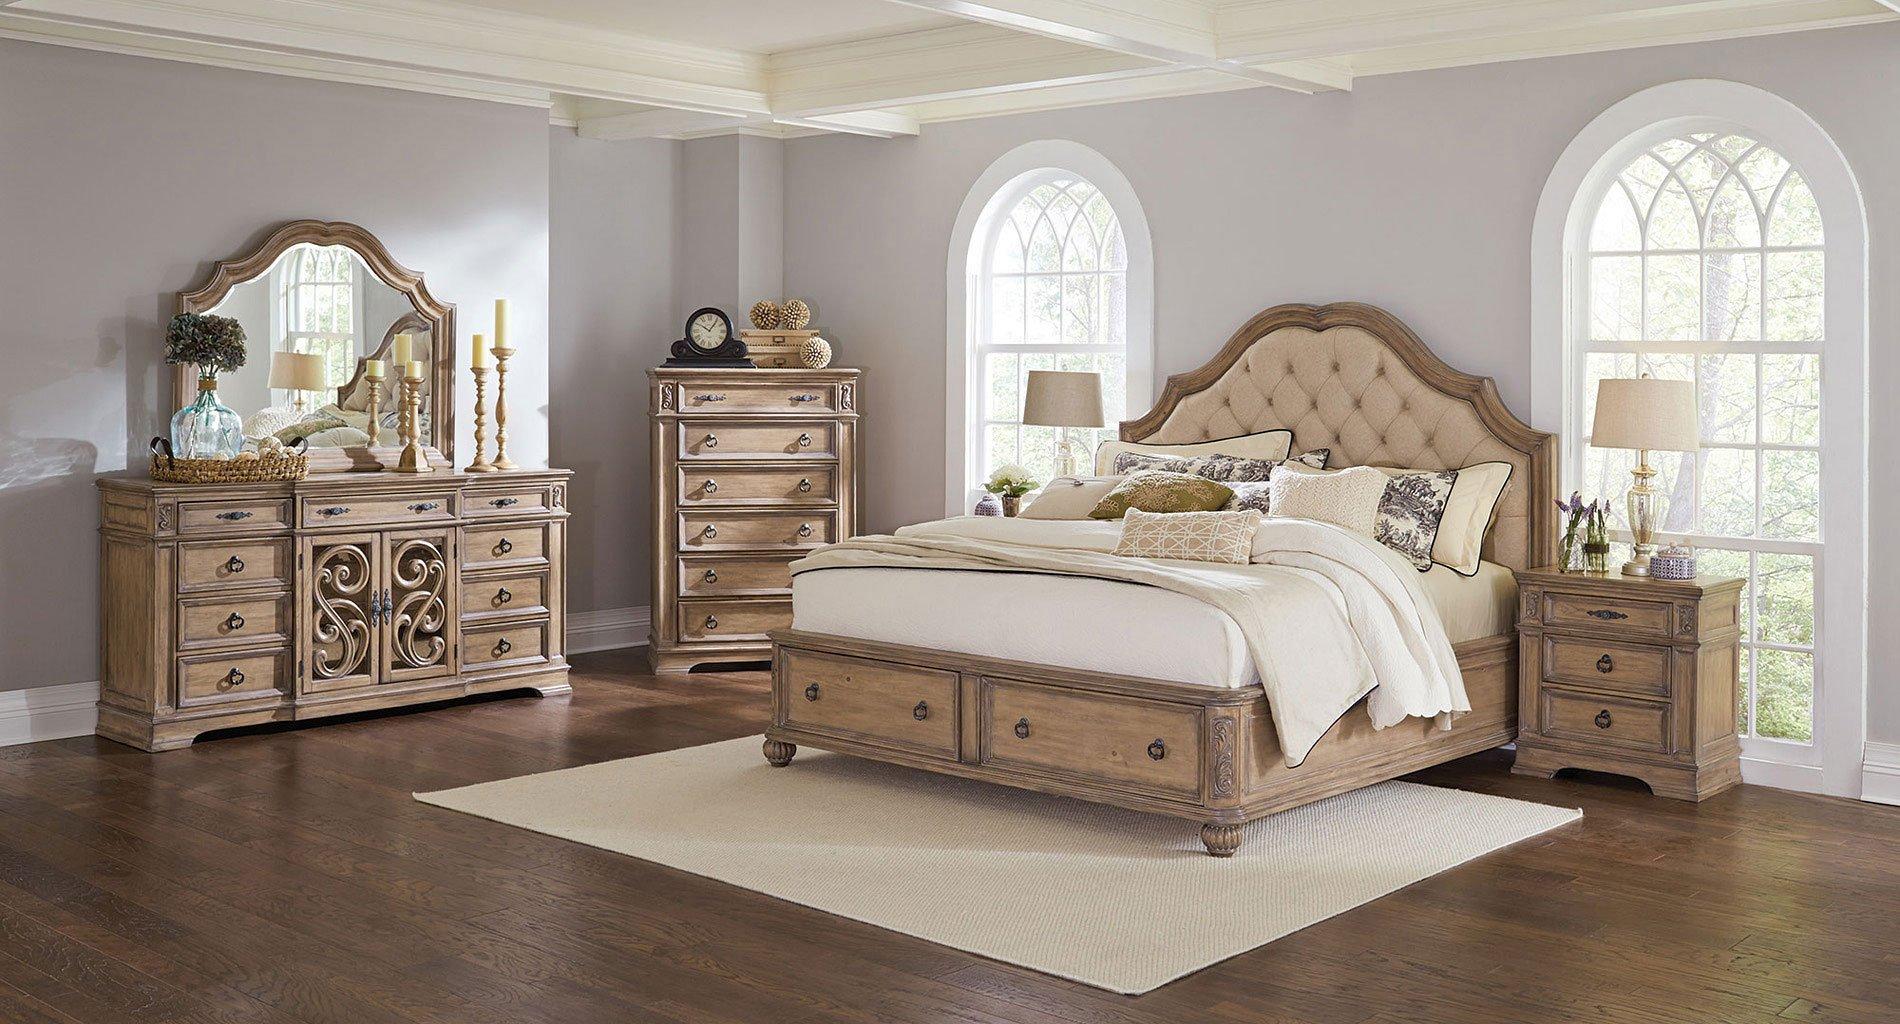 Ilana Storage Bedroom Set by Coaster Furniture   FurniturePick